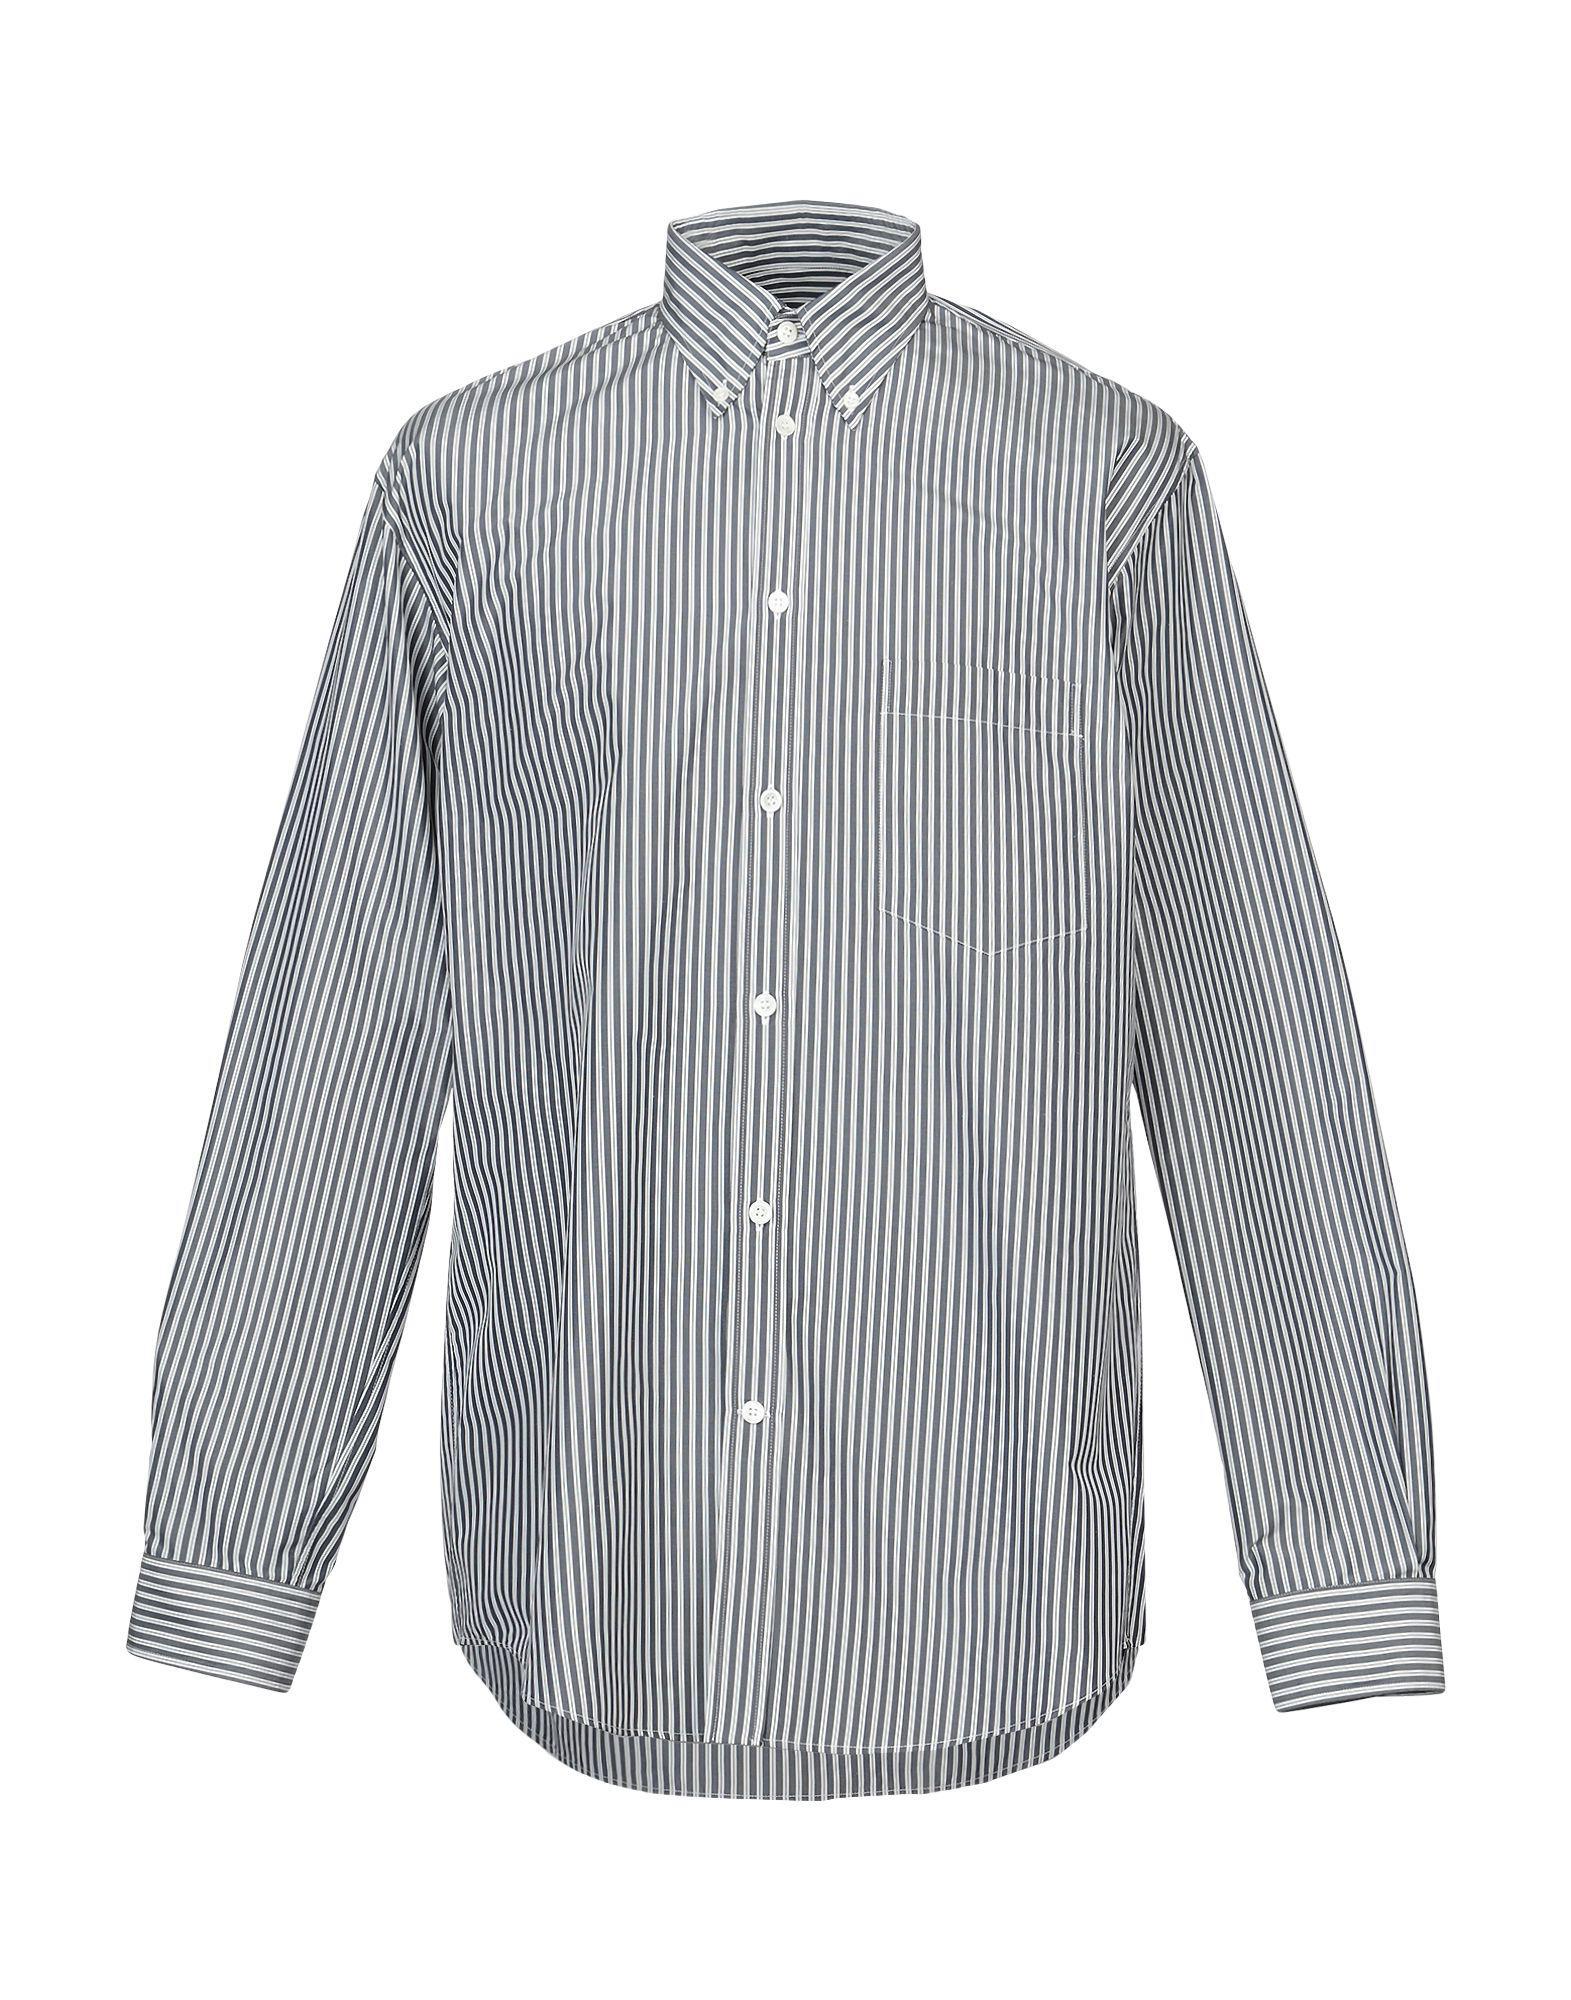 79d083dc Lyst - Balenciaga Shirt in Gray for Men